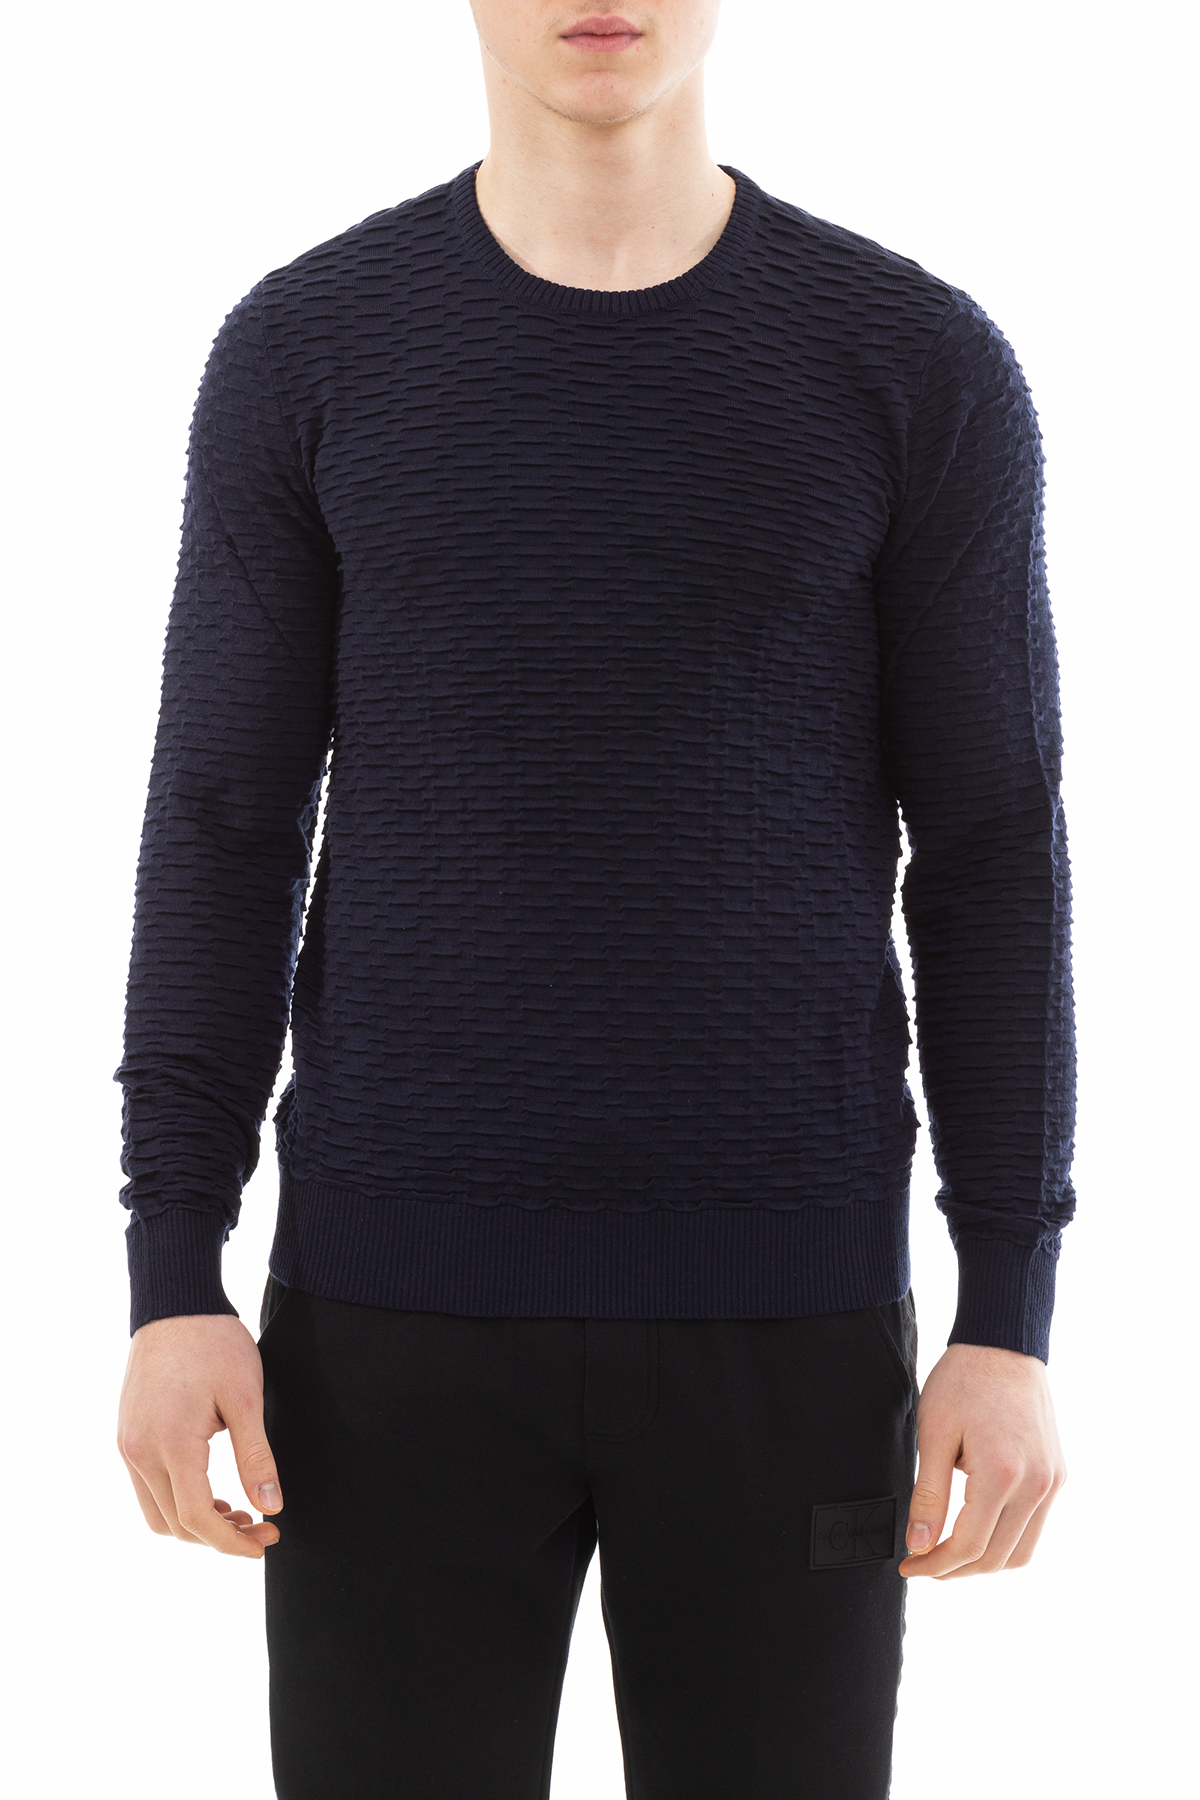 Emporio Armani Regular Fit Basic Uzun Kollu Erkek Triko